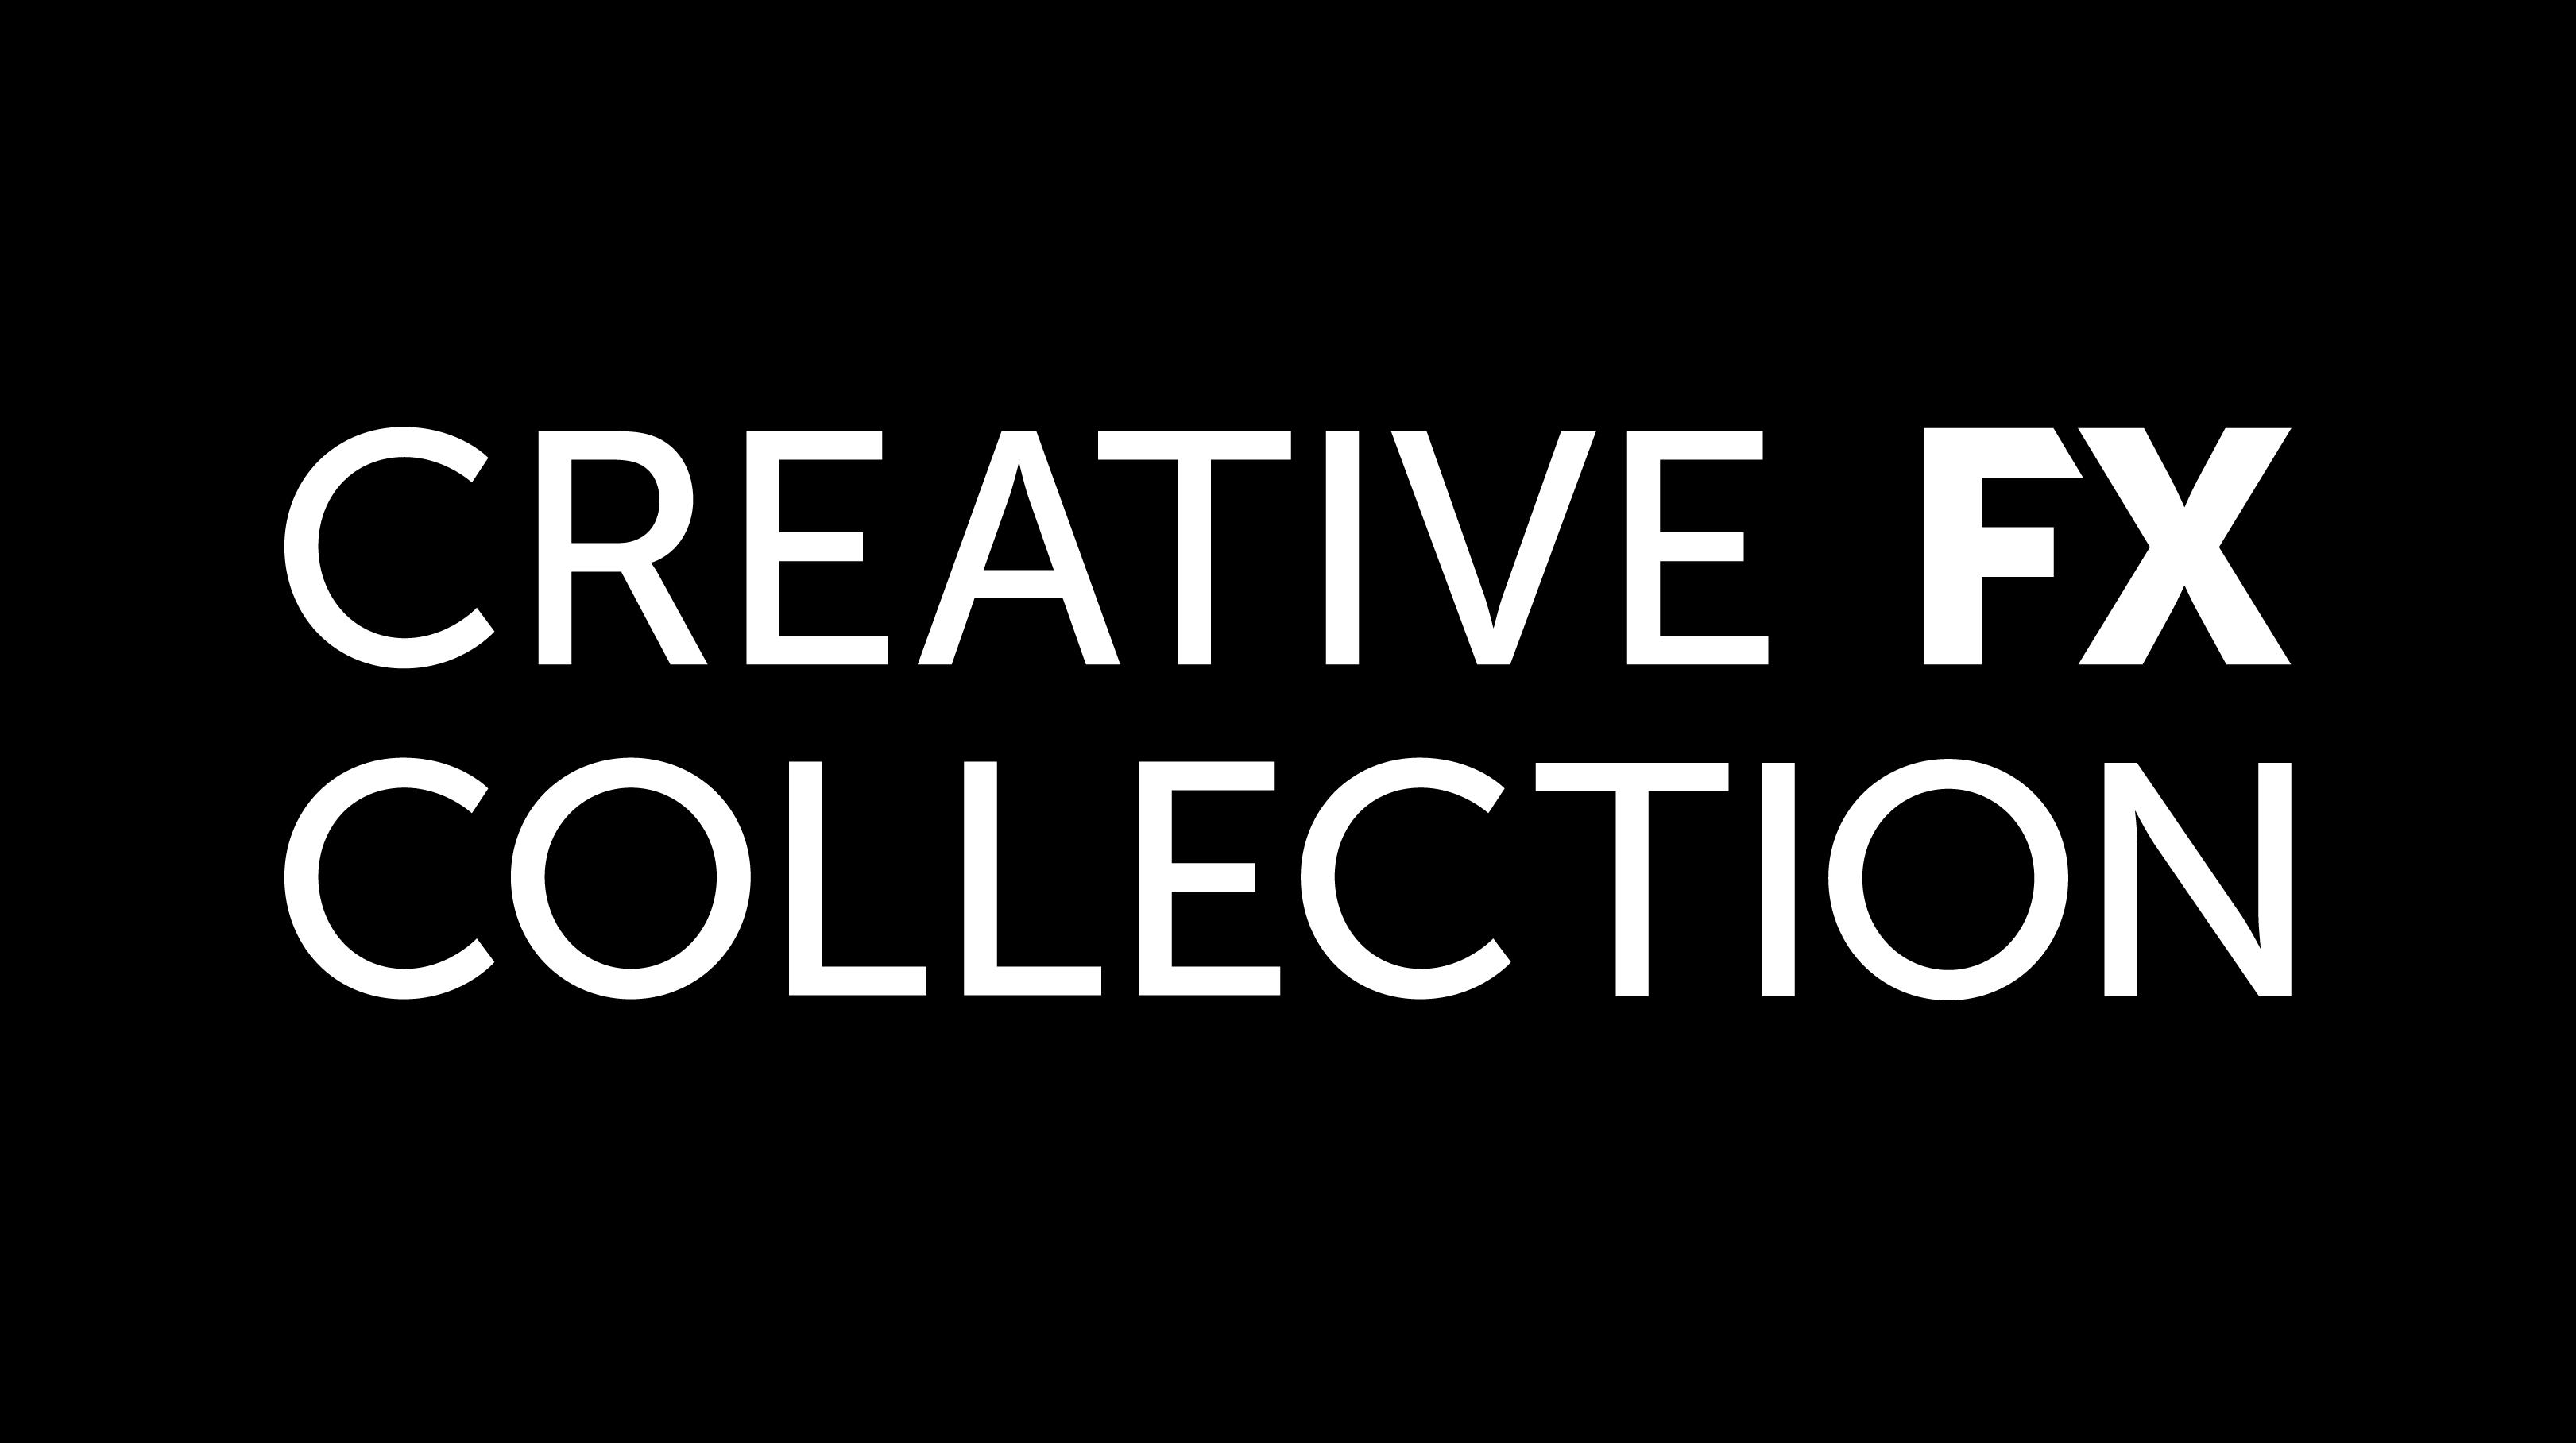 AIR Creative FX Collection